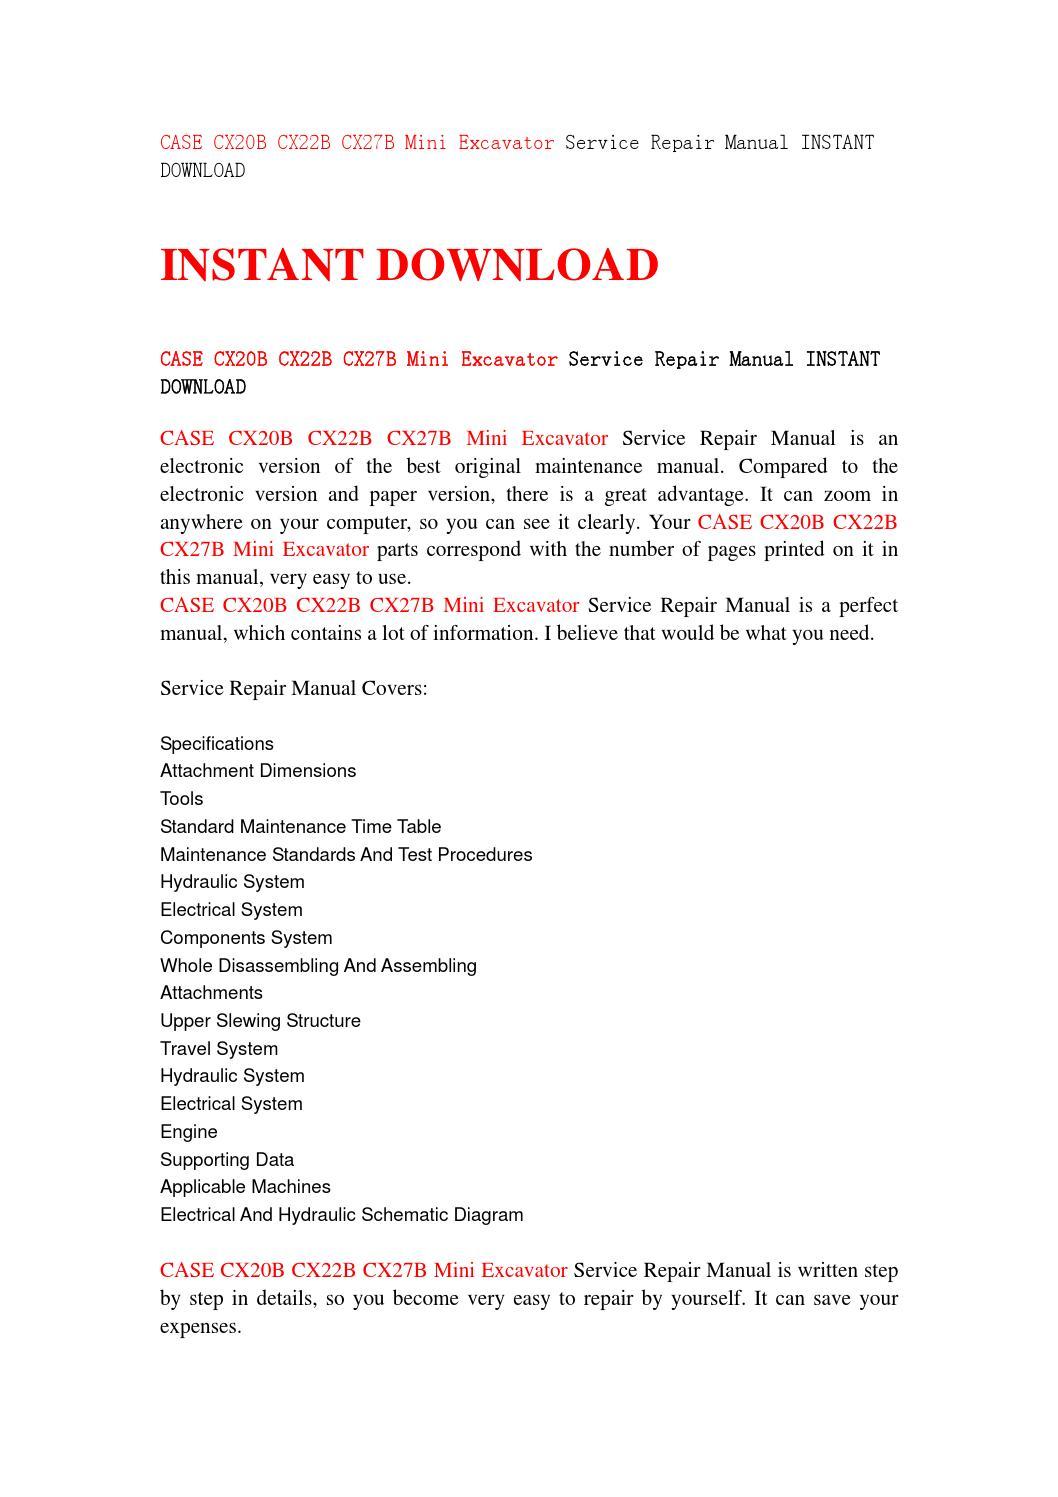 Case Cx20b Cx22b Cx27b Mini Excavator Service Repair Manual Instant Schematic Download By Jshenns Issuu